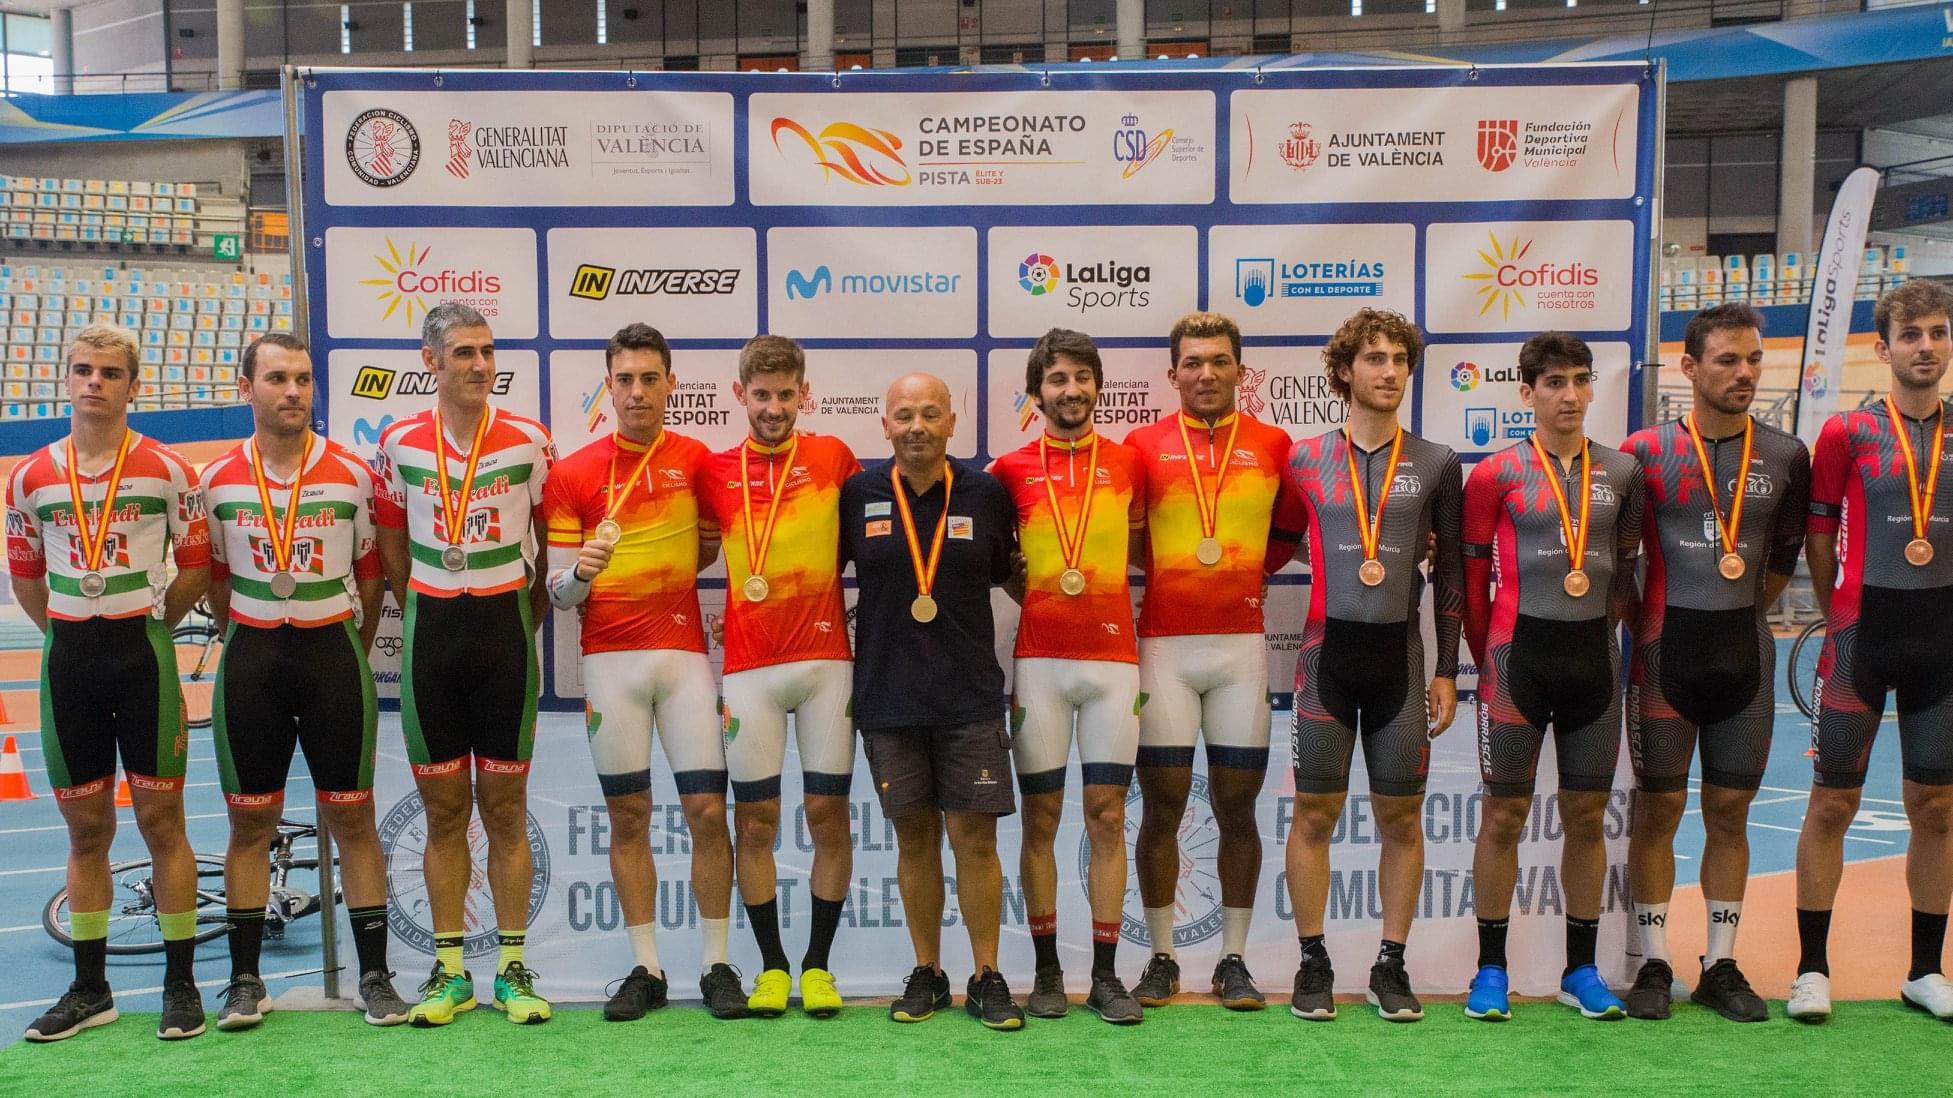 Albert Torres reina en el Campeonato de España de Pista 2019